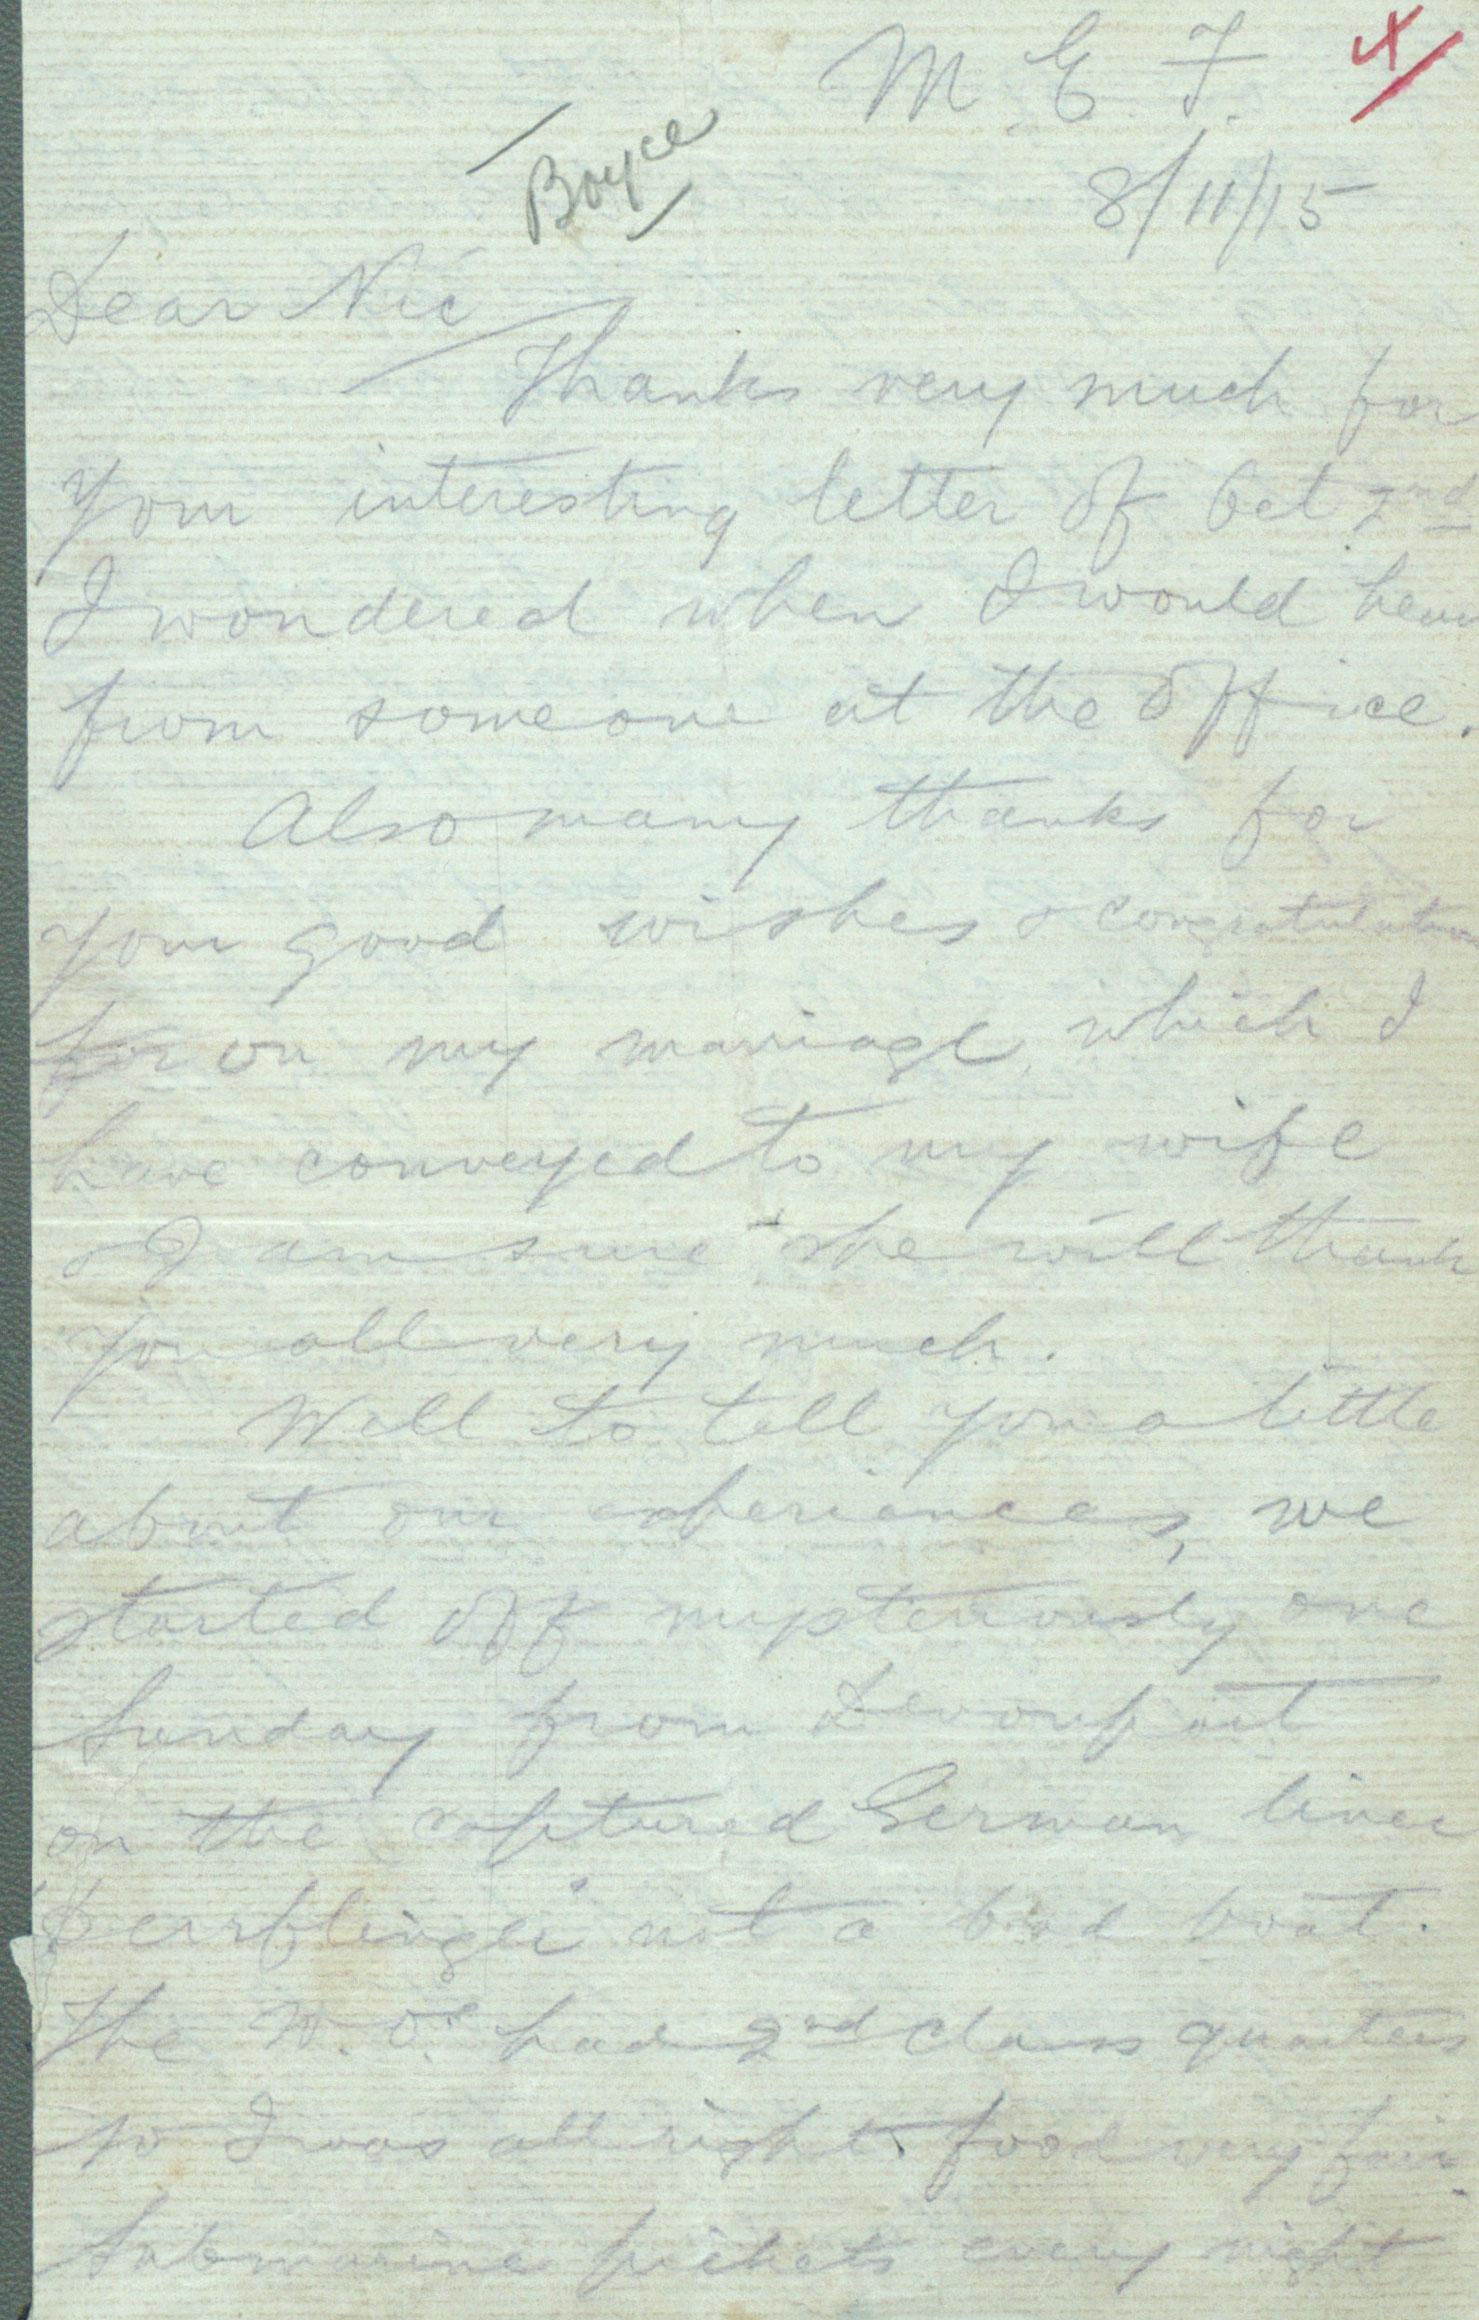 Wold War I-era letter written by solider